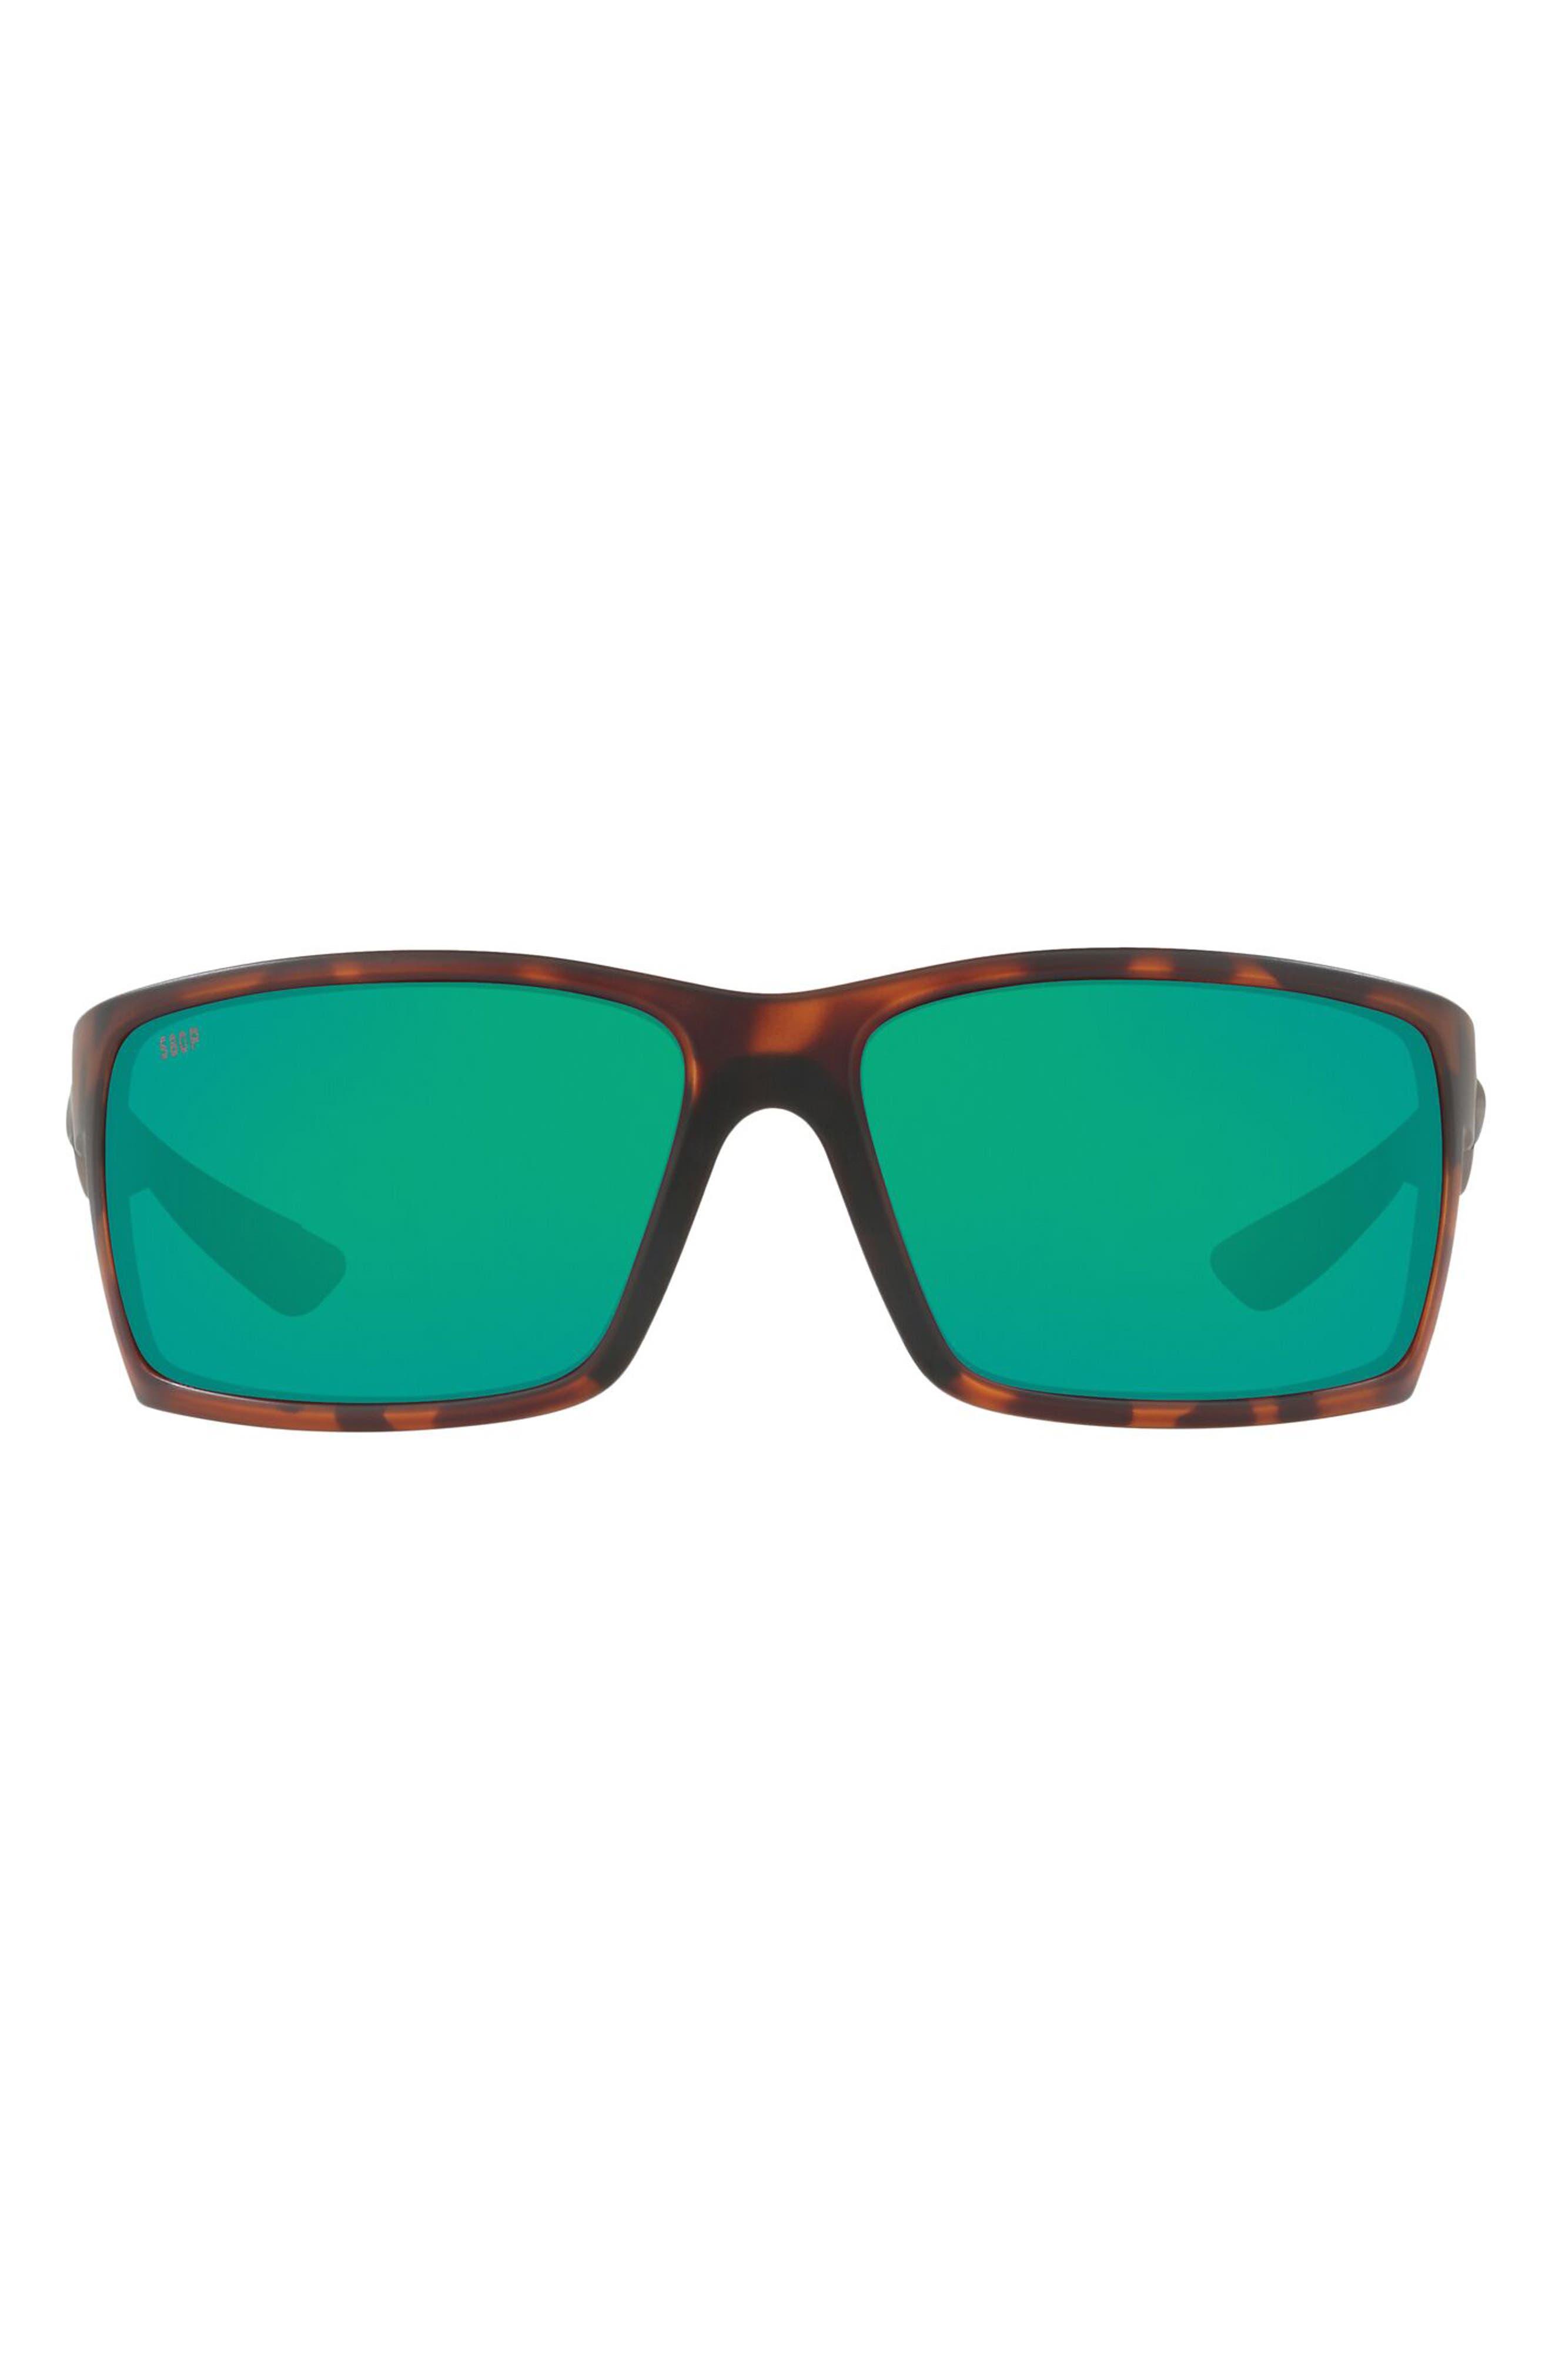 64mm Mirrored Polarized Rectangular Sunglasses